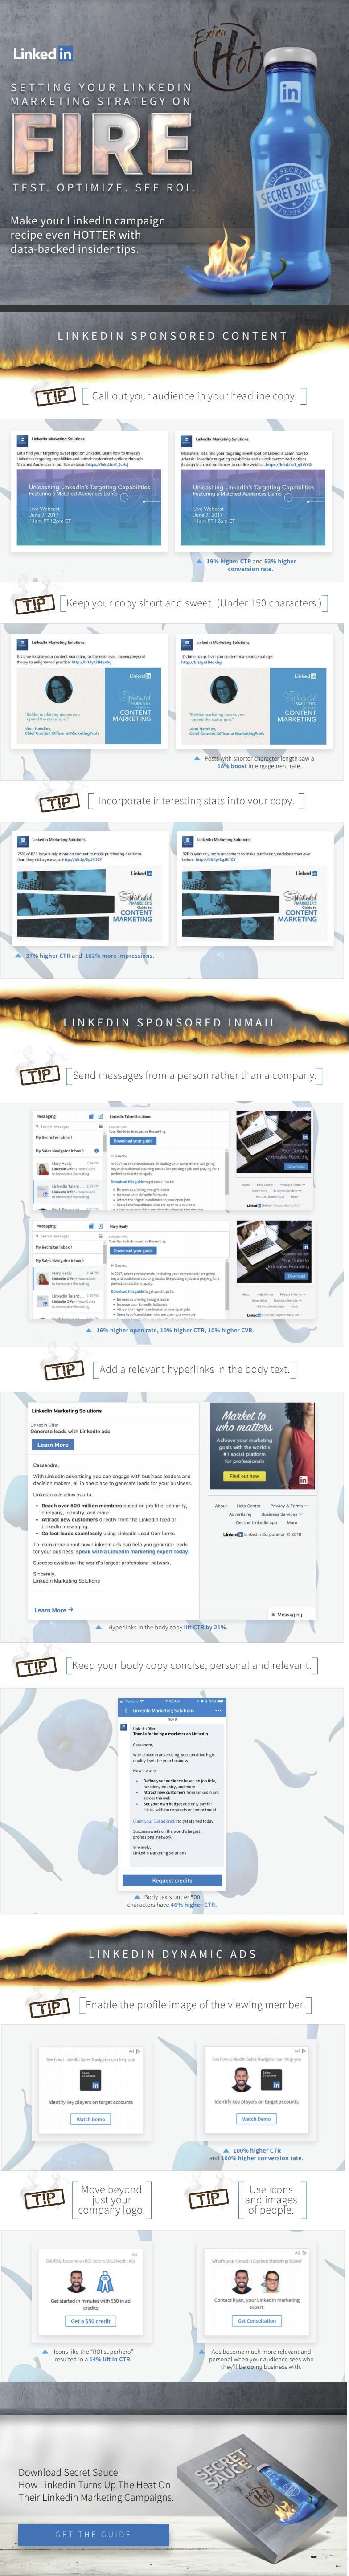 Infographic: Linkedin Advertising Tips